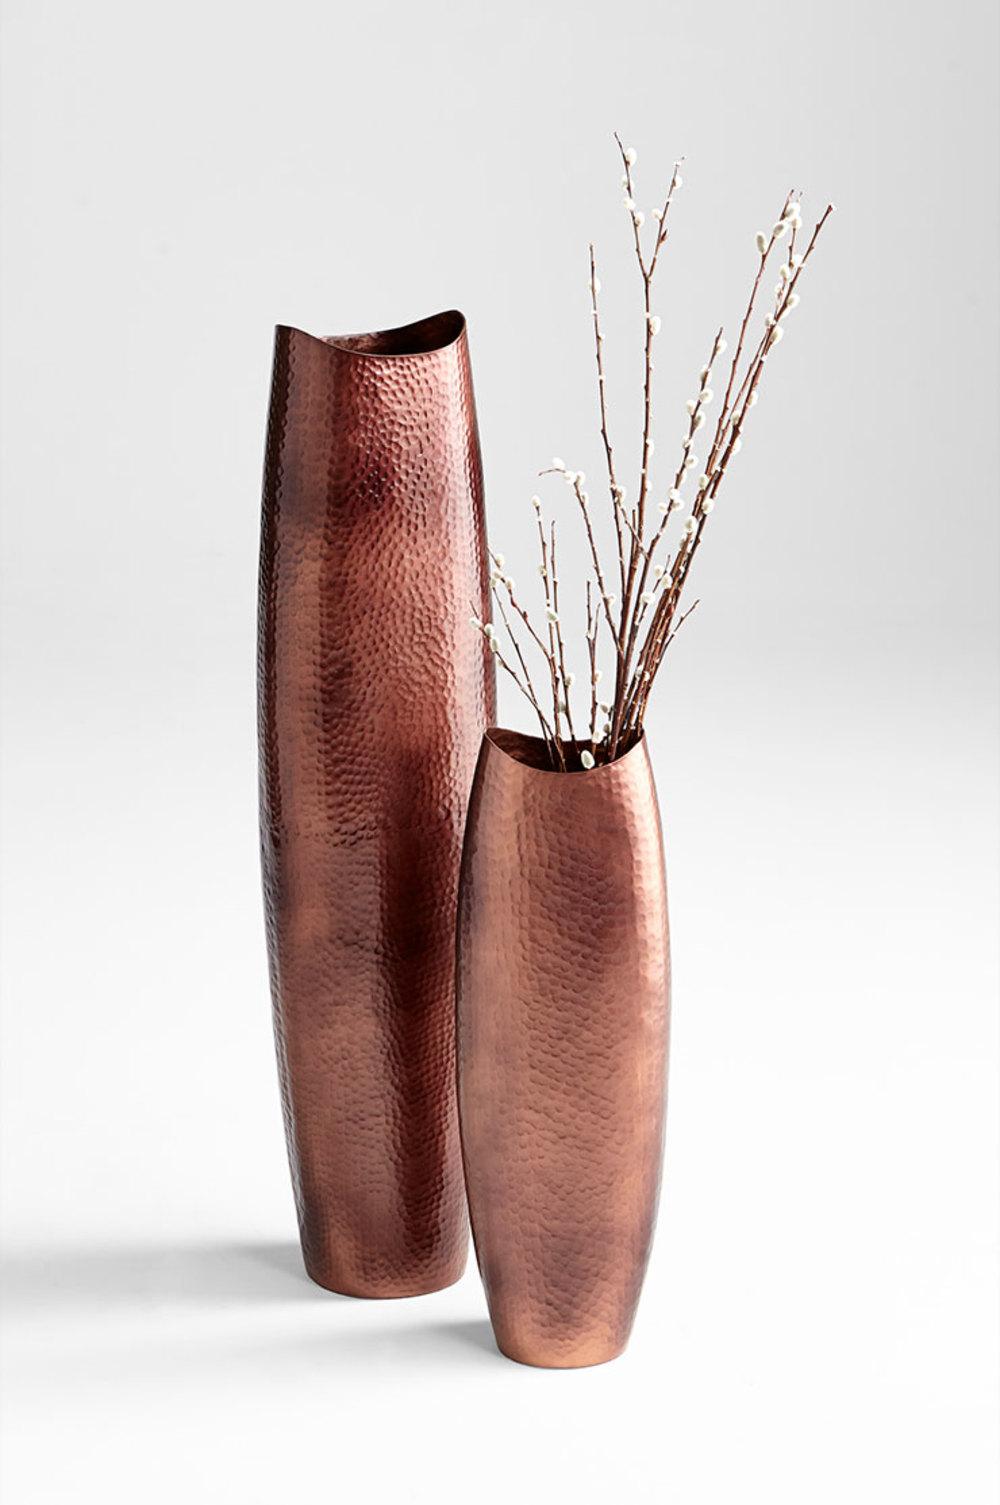 Cyan Designs - Large Tuscany Vase